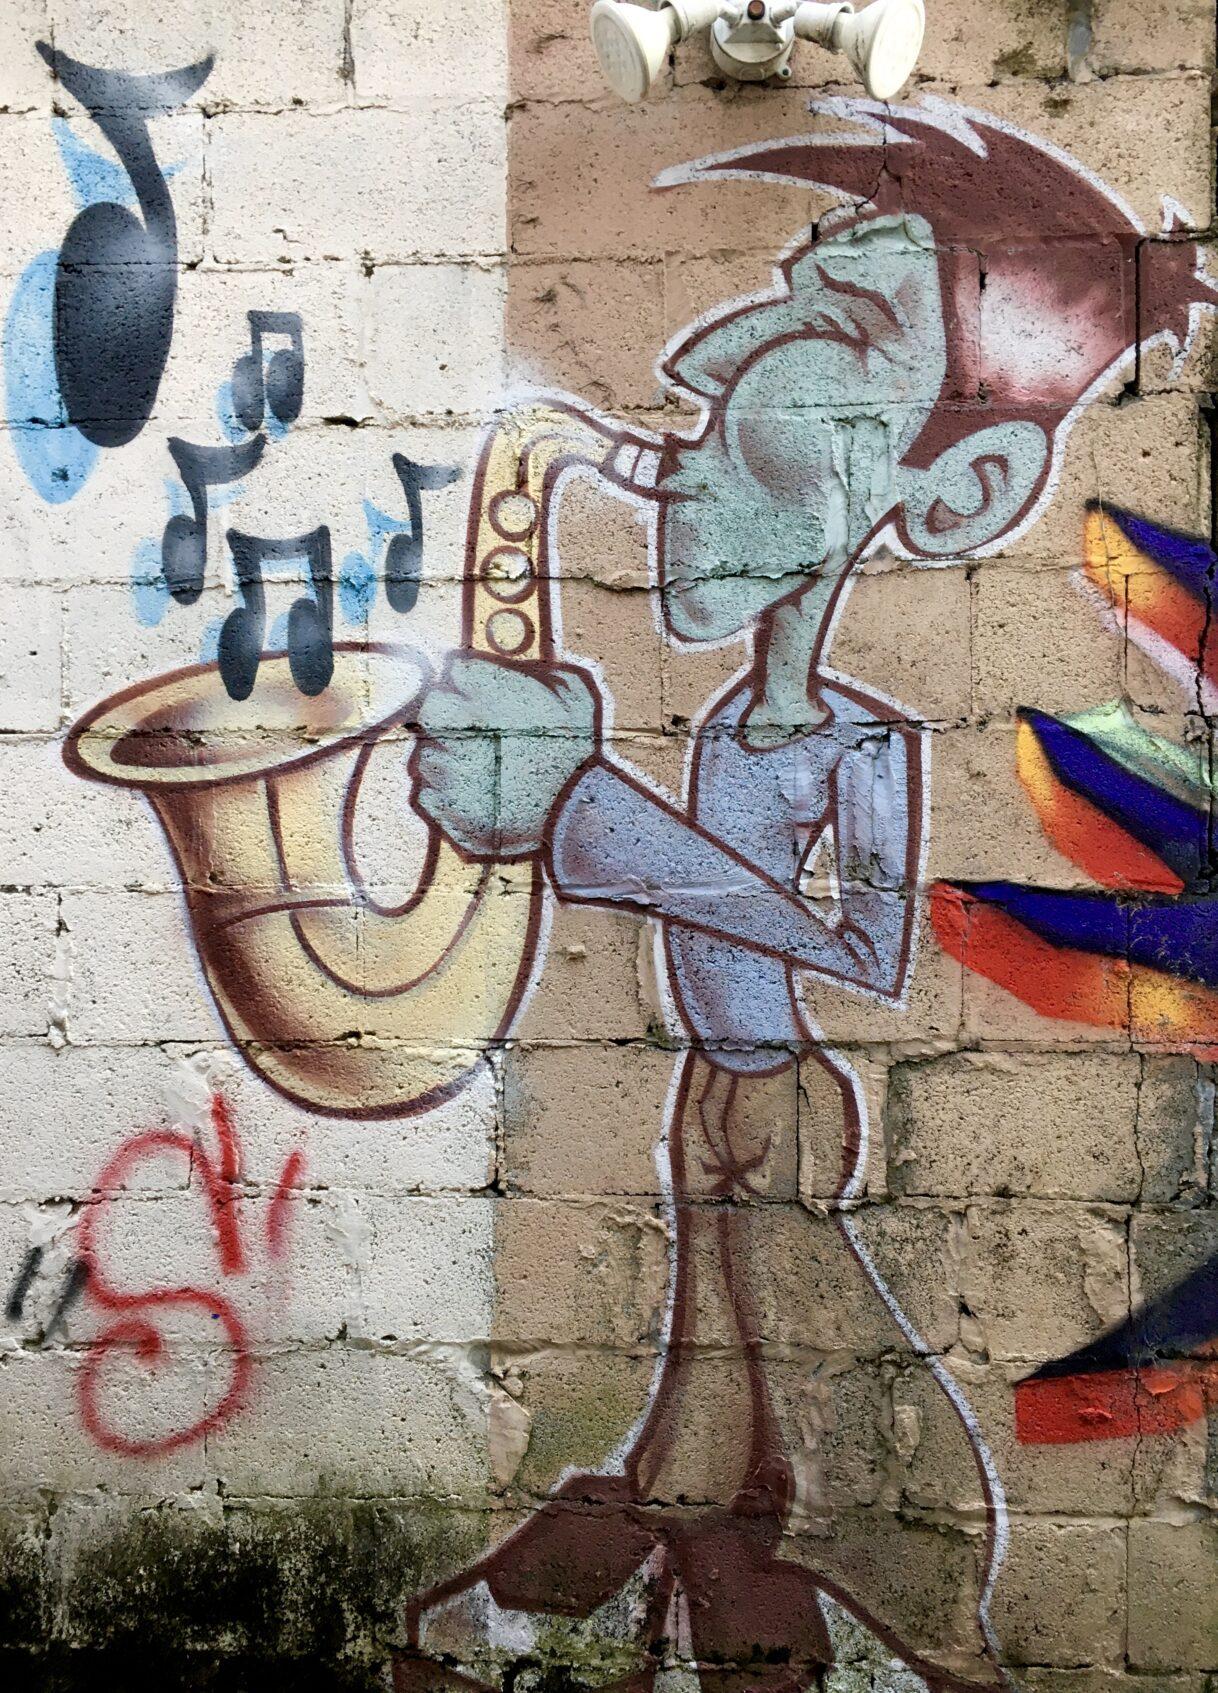 A Hidden Graffiti Alley in Belmont – Nashville, Tennessee – 01/26/2021